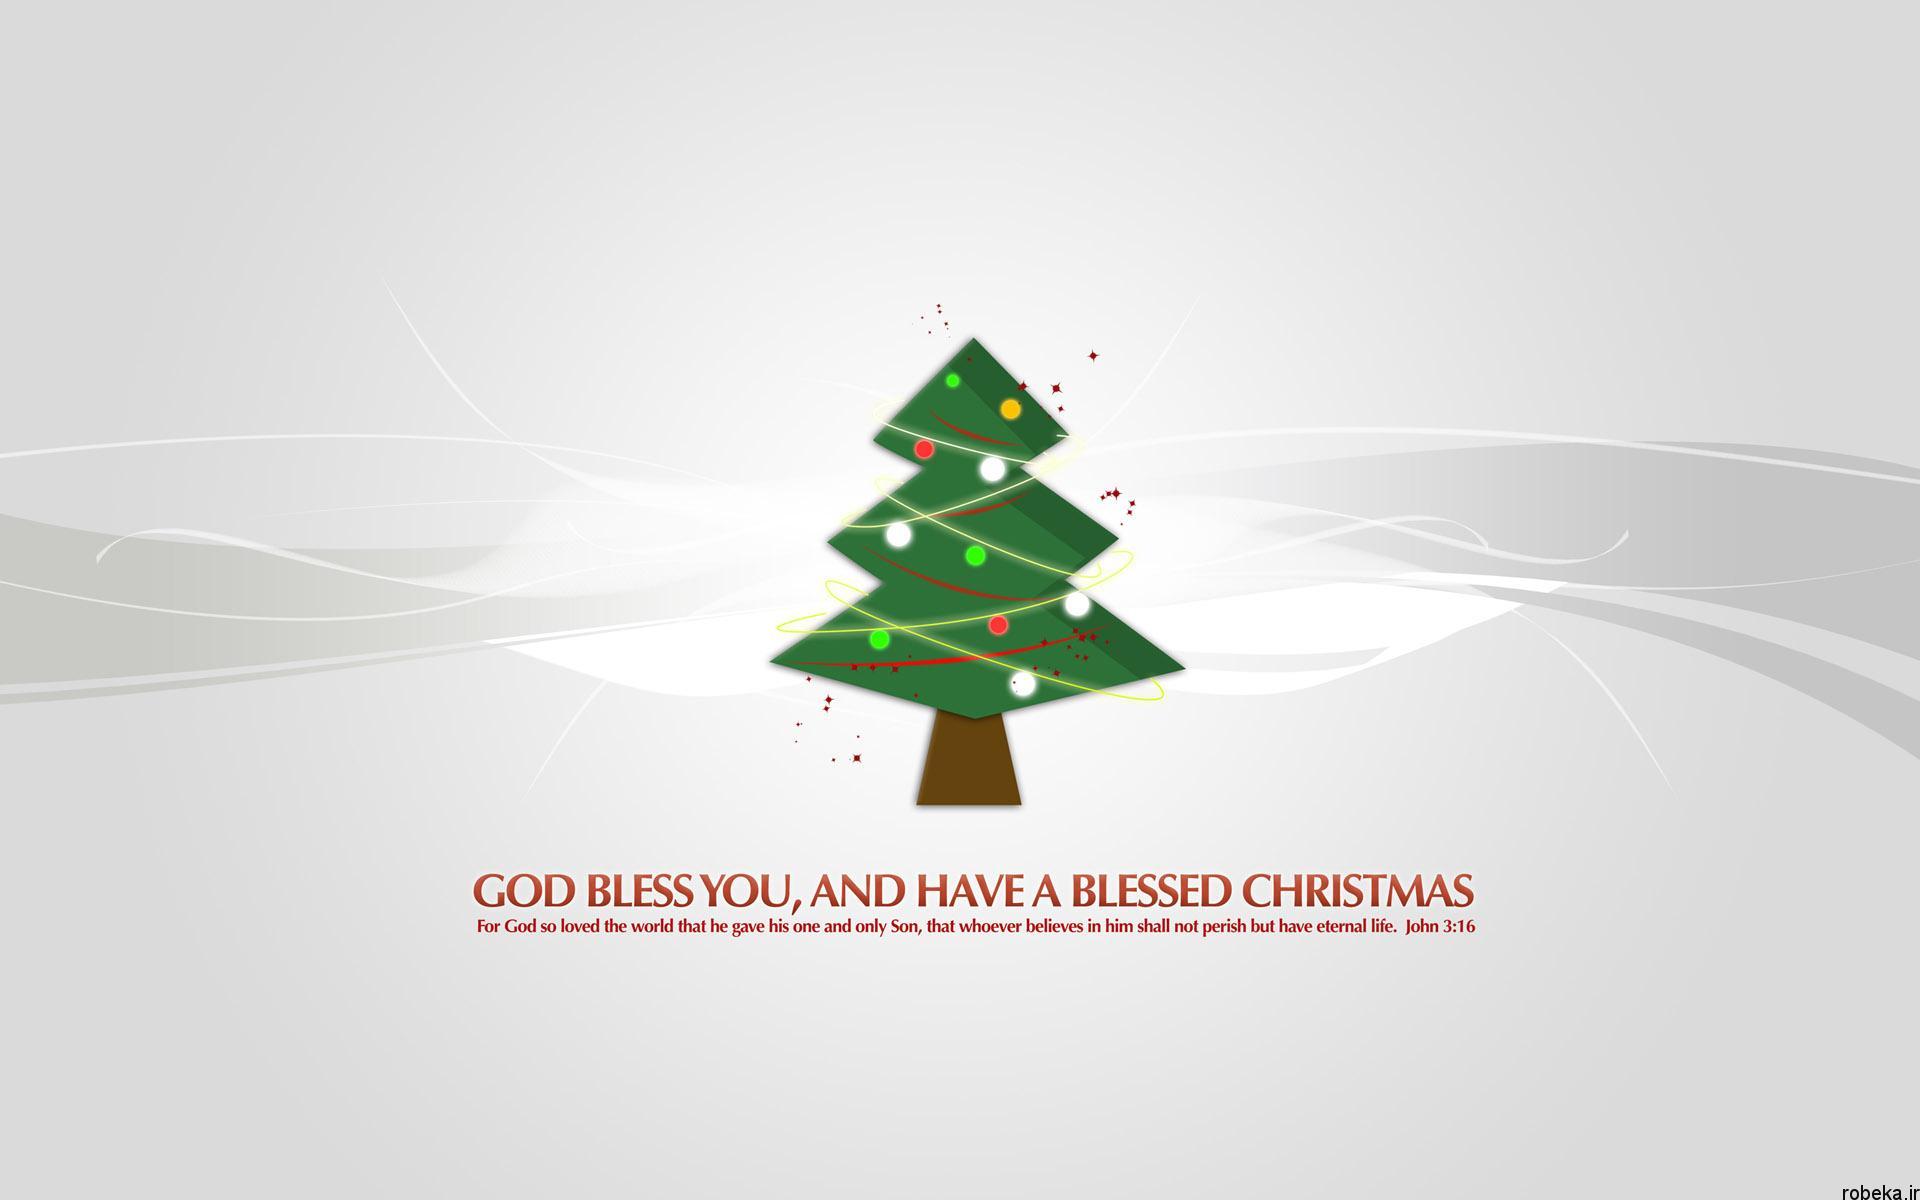 Download Christmas Wallpapers HD Quality 8 دانلود والپیپر کریسمس با کیفیت بالا